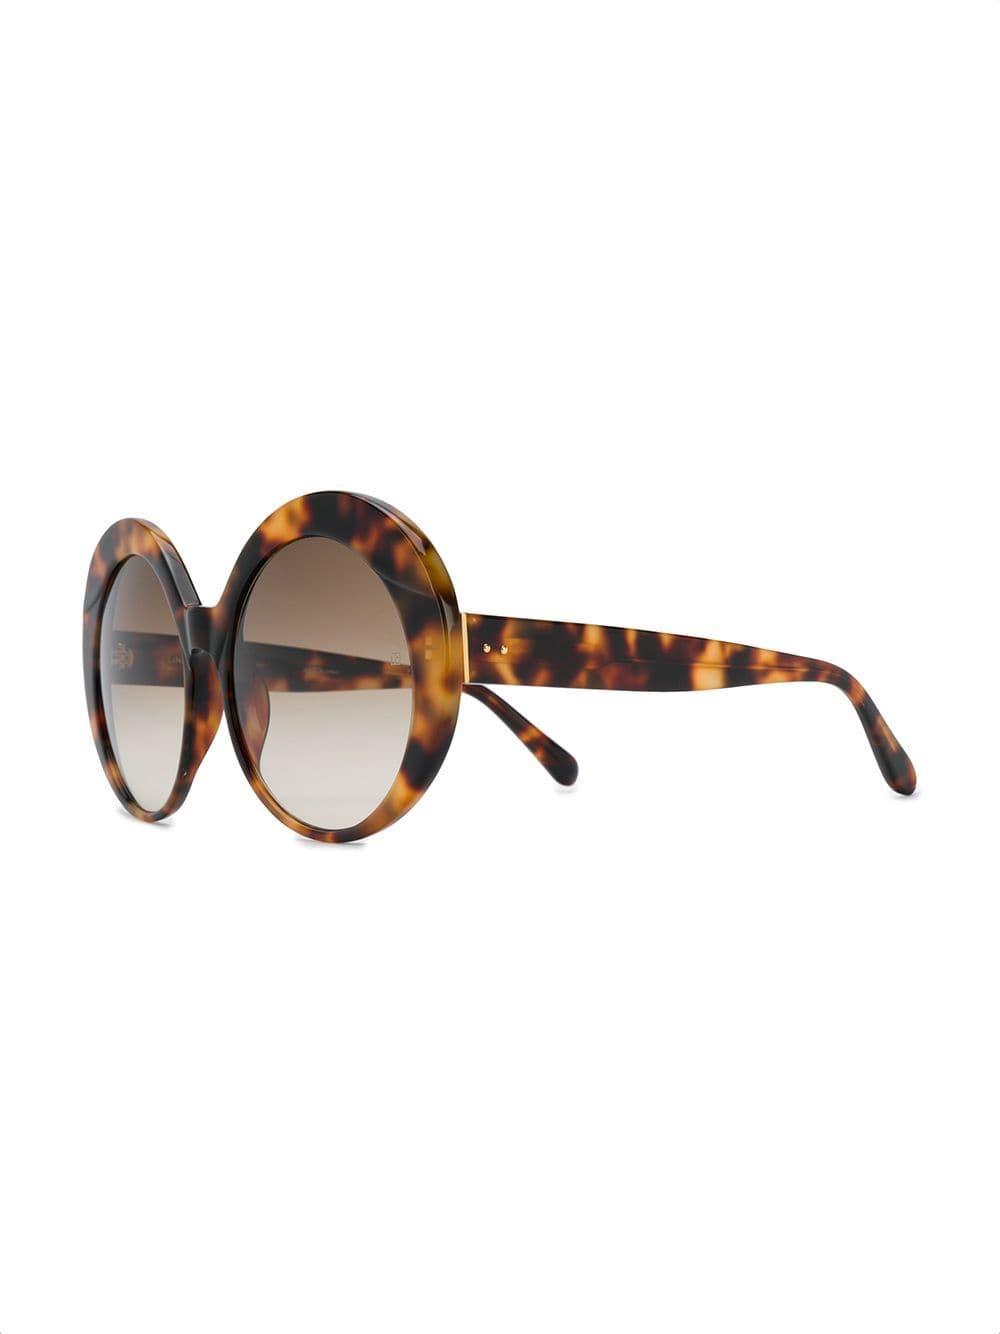 1b4efc371d Lyst - Linda Farrow Oversized Sunglasses in Brown